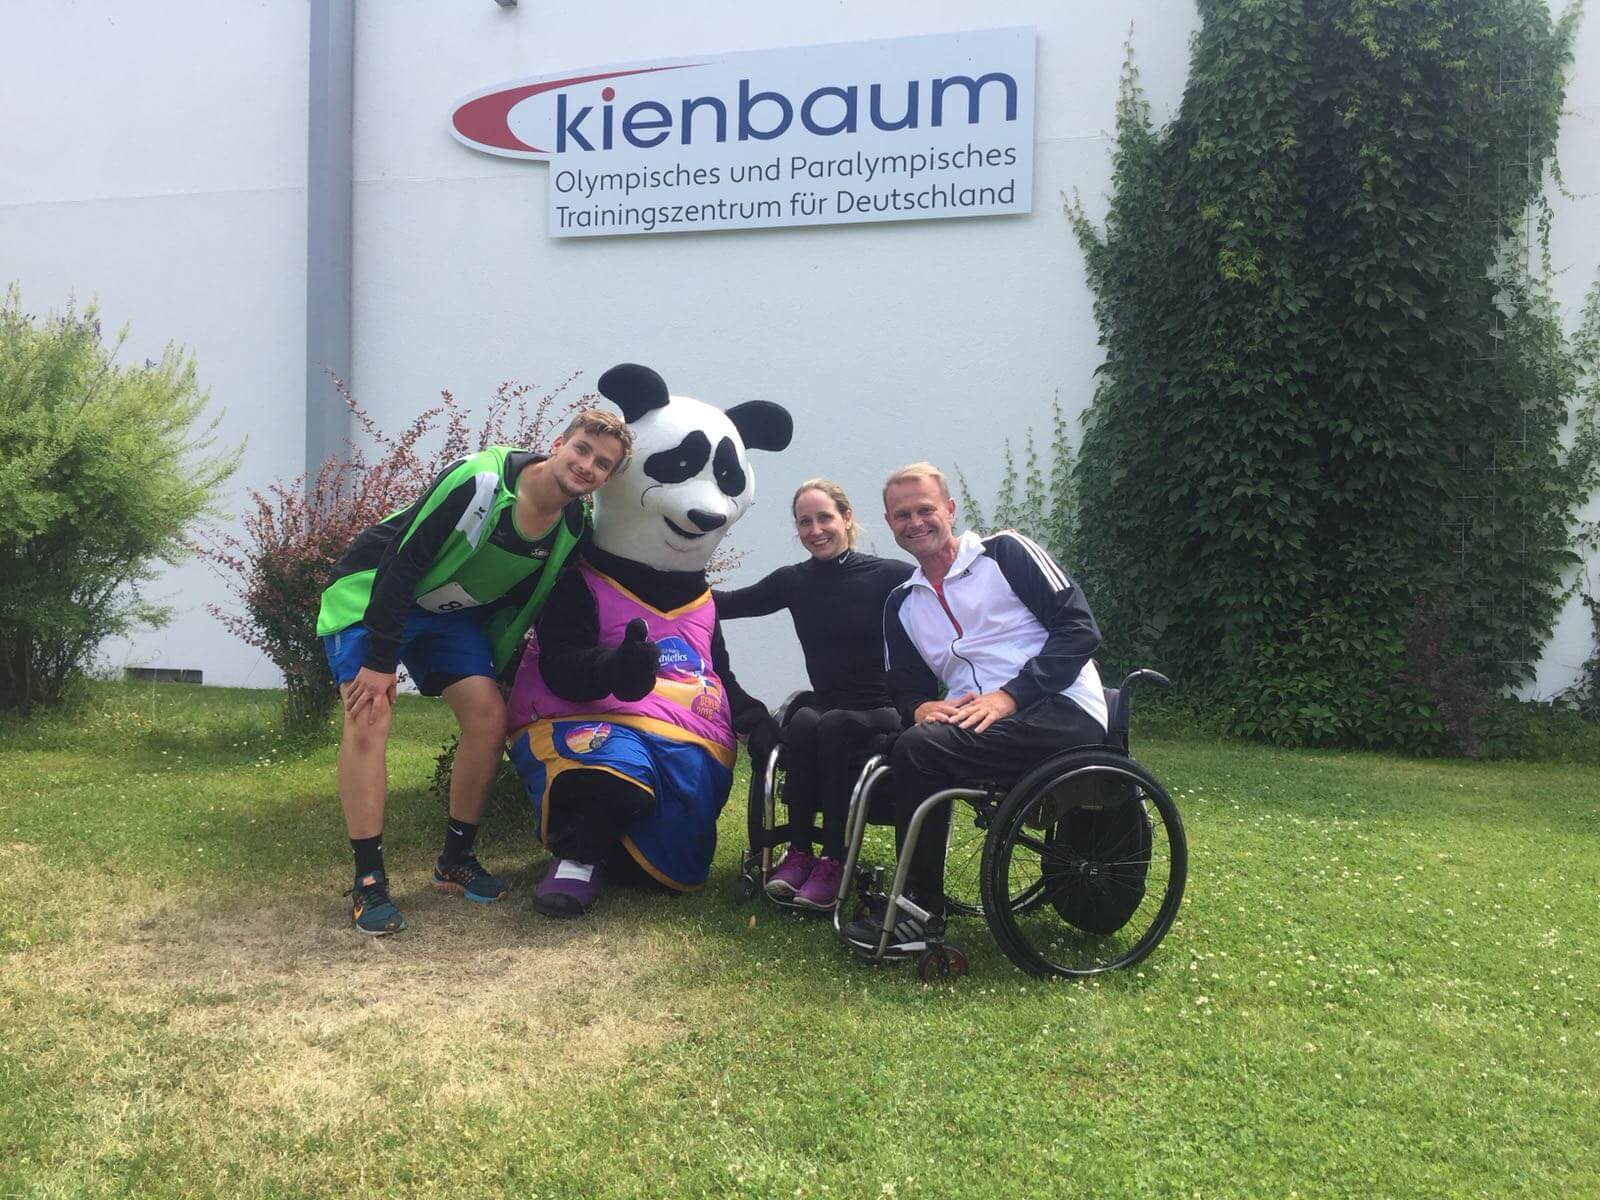 Deutsche Meisterschaften Kienbaum 2018